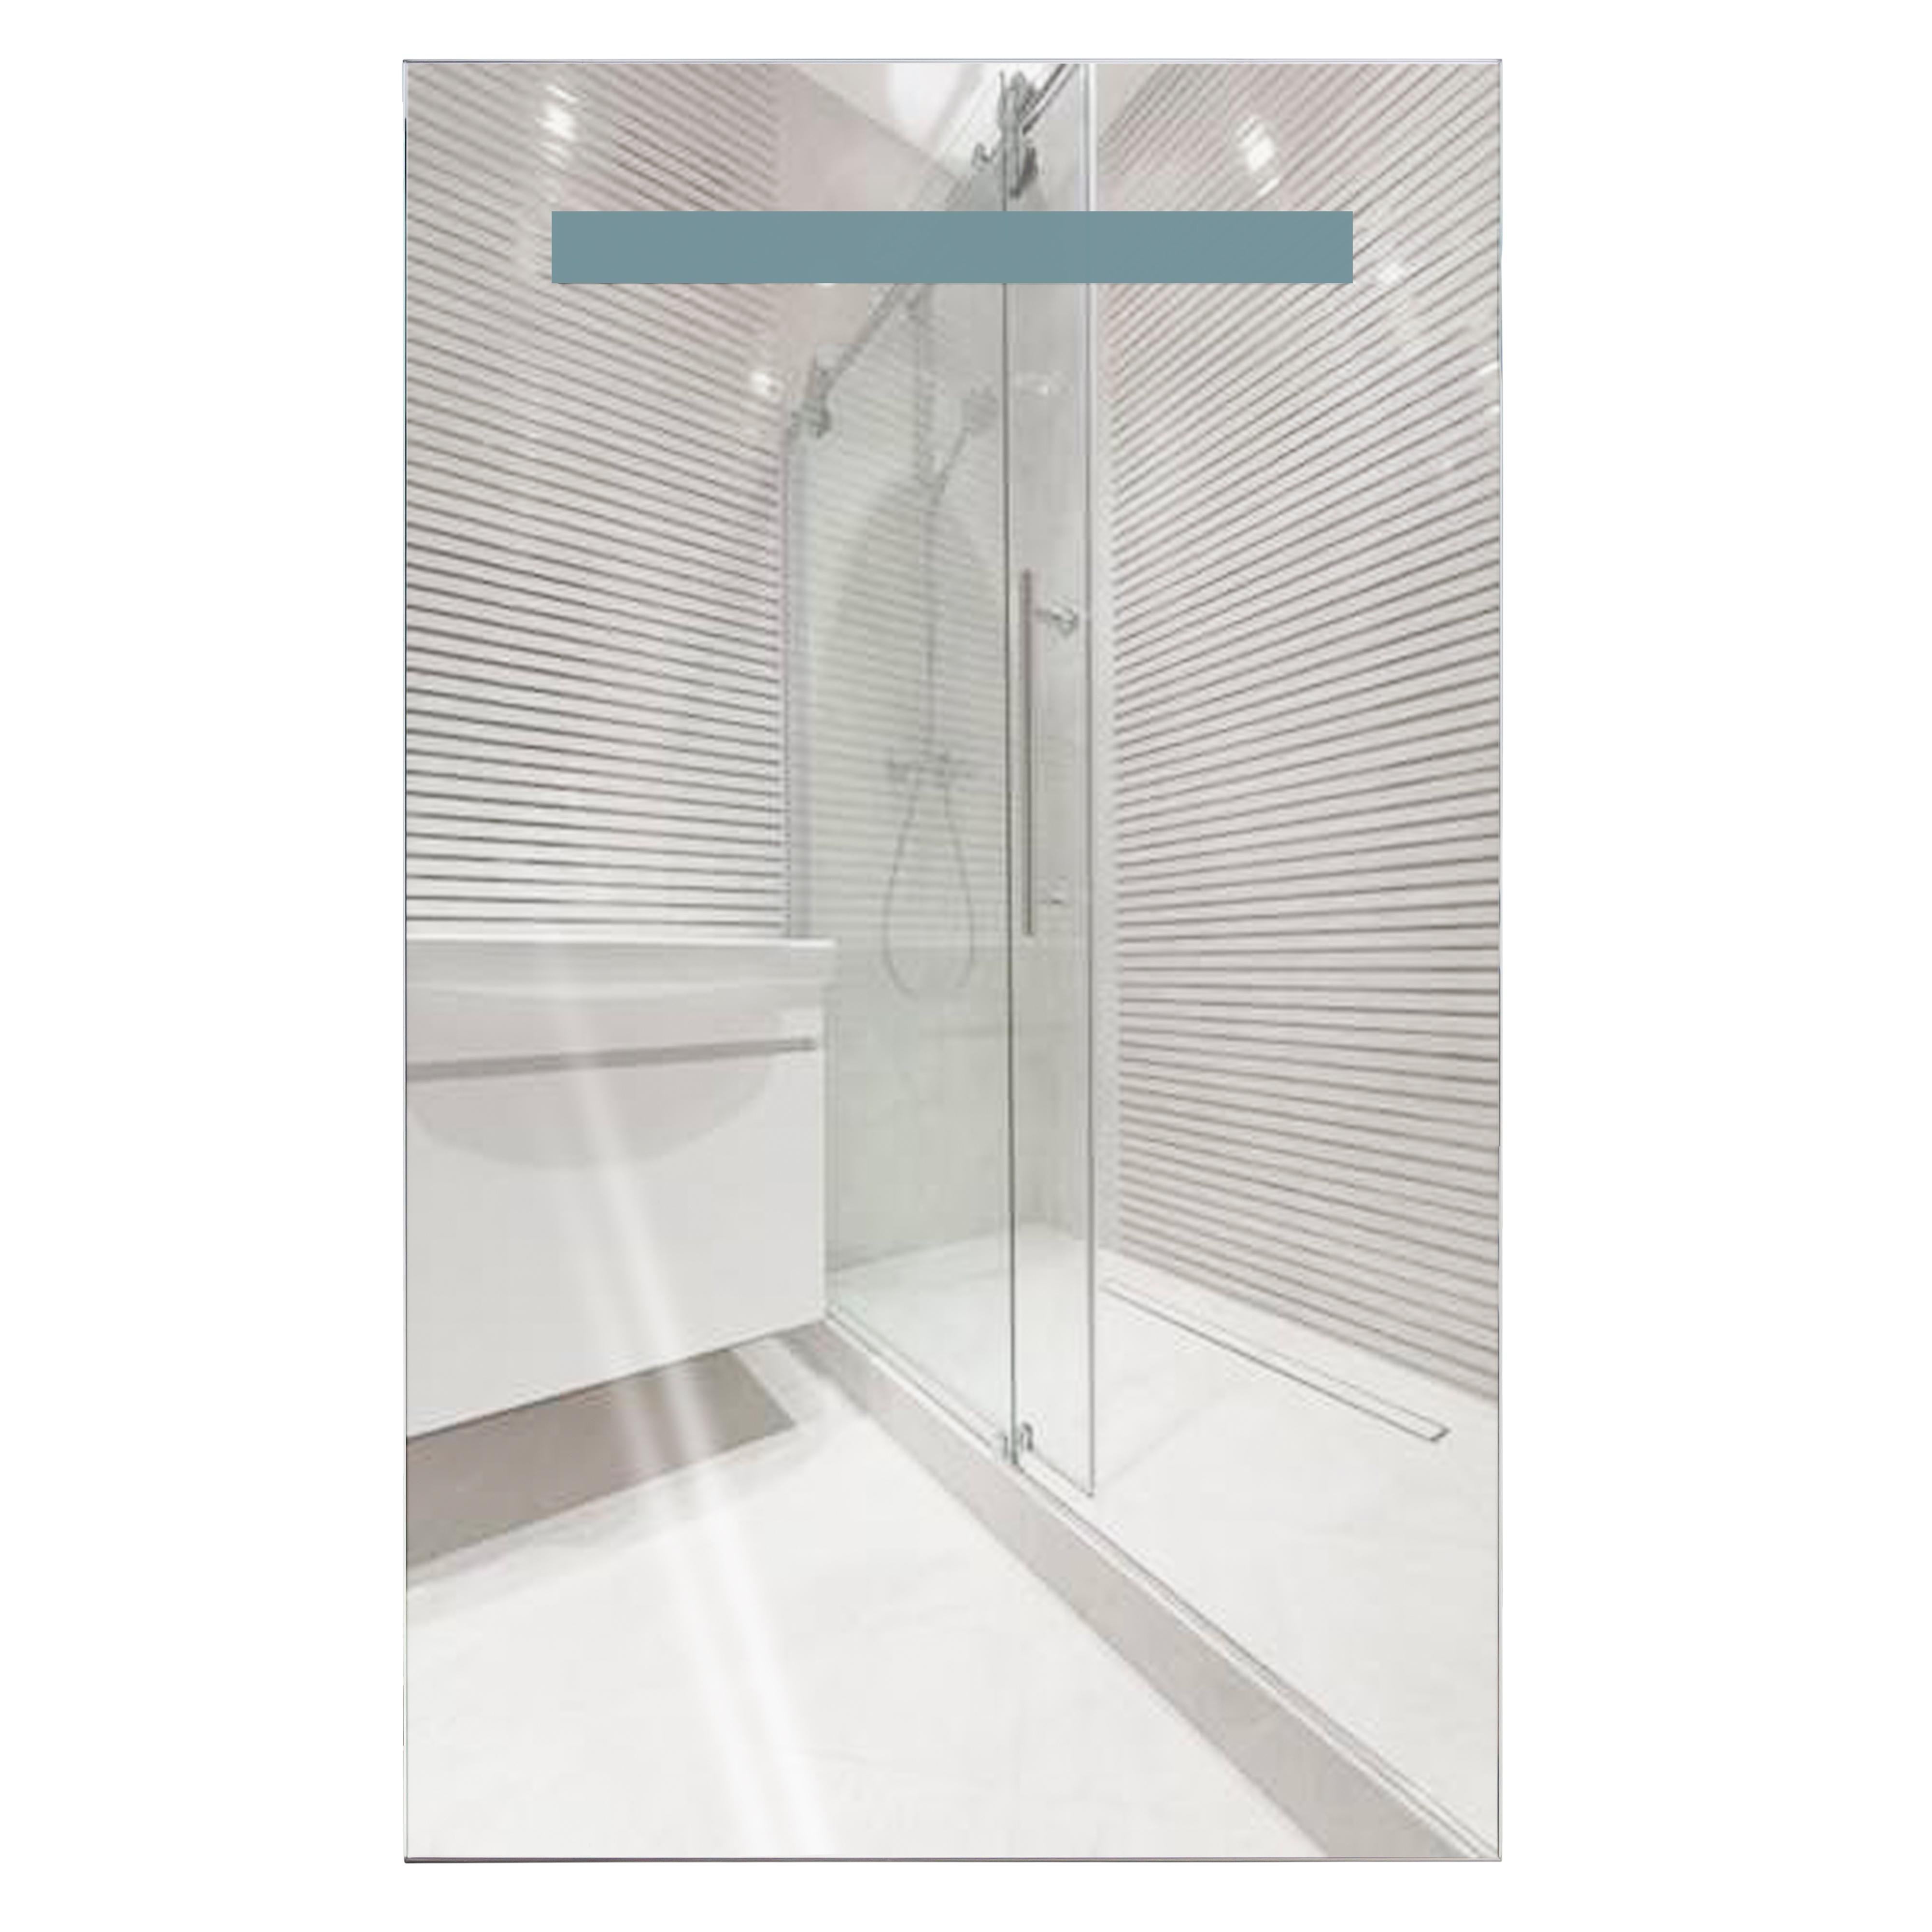 30 X 30 Medicine Cabinet Led Lighted Medicine Cabinet 18 X 30 With Sliding Mirror Door